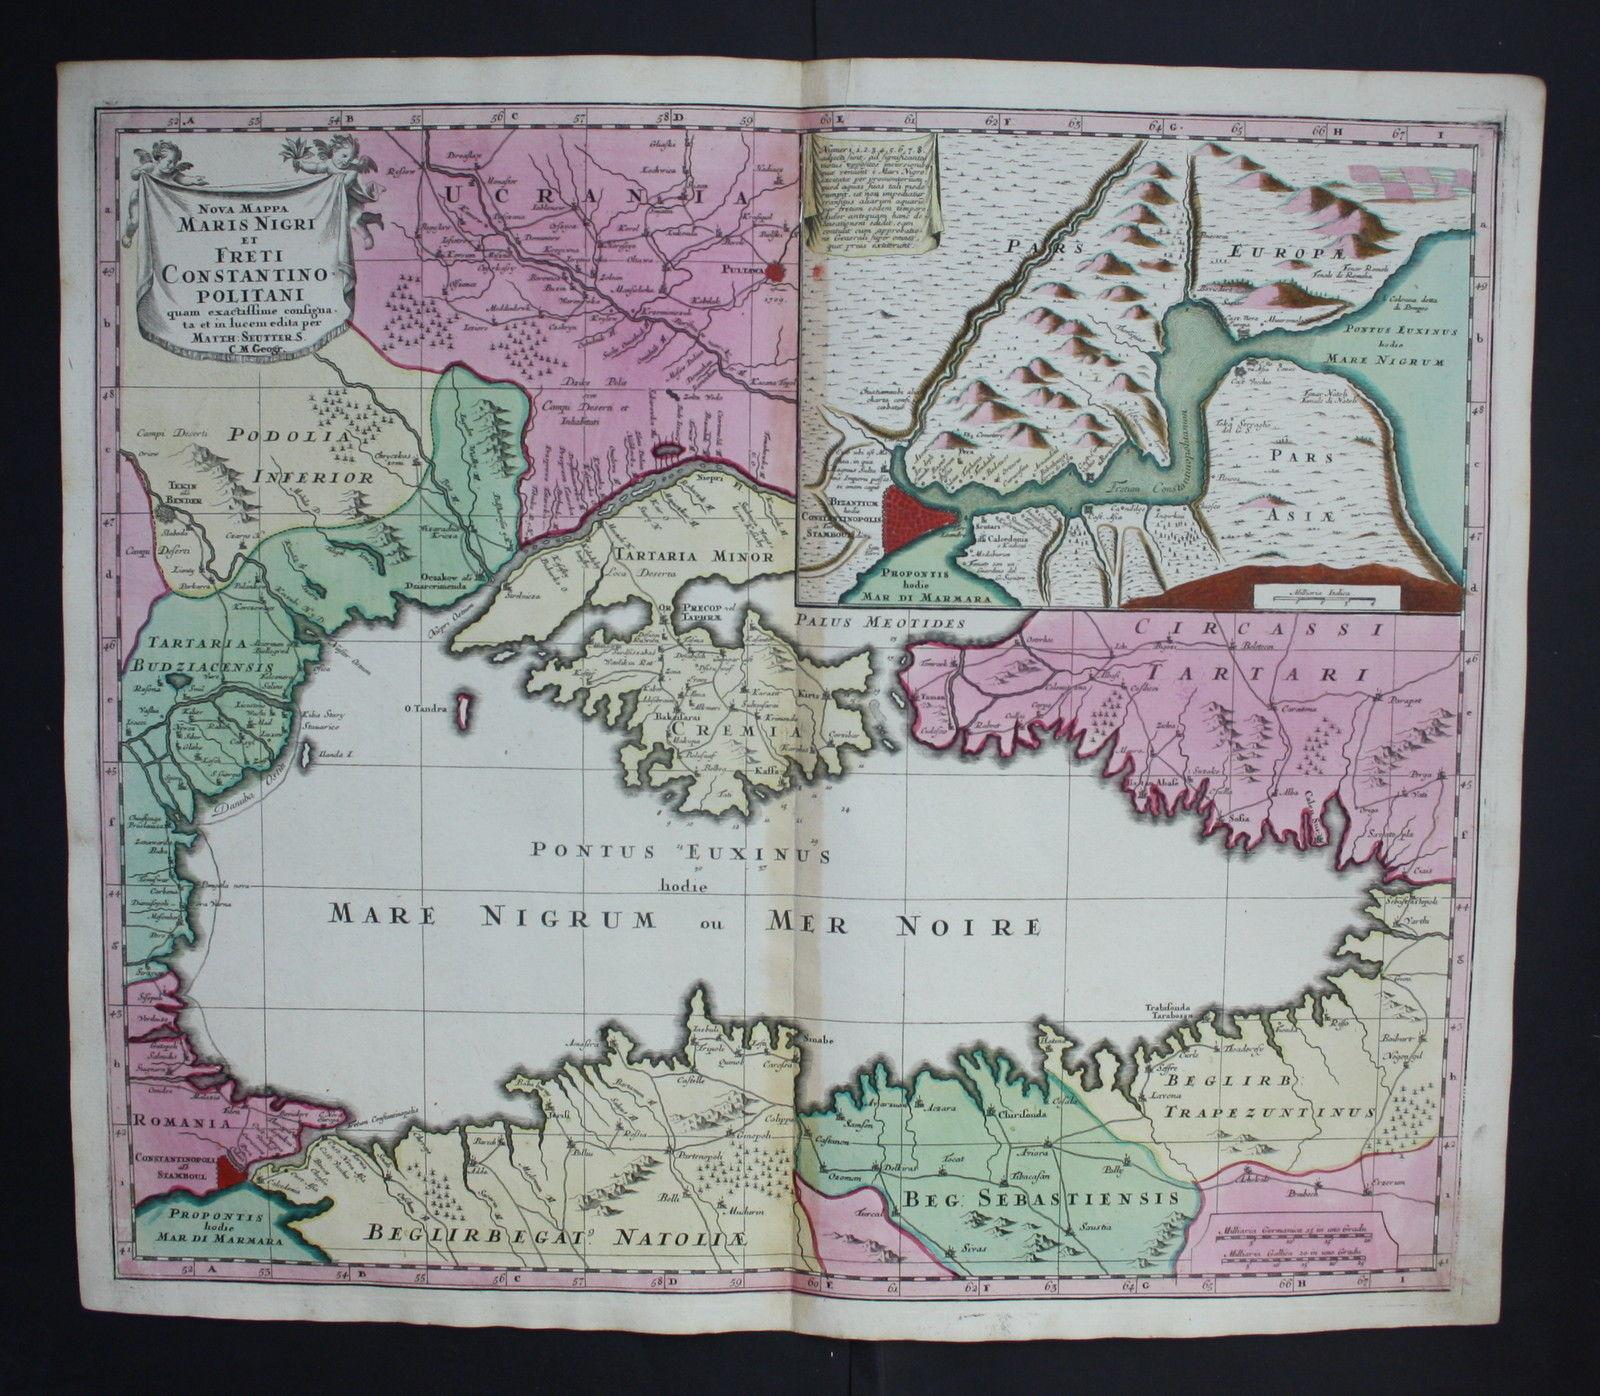 Krim Russia Map on kolb russia map, kris russia map, kiev russia map, kursk russia map, ukraine russia border map, kara russia map, kuban russia map,